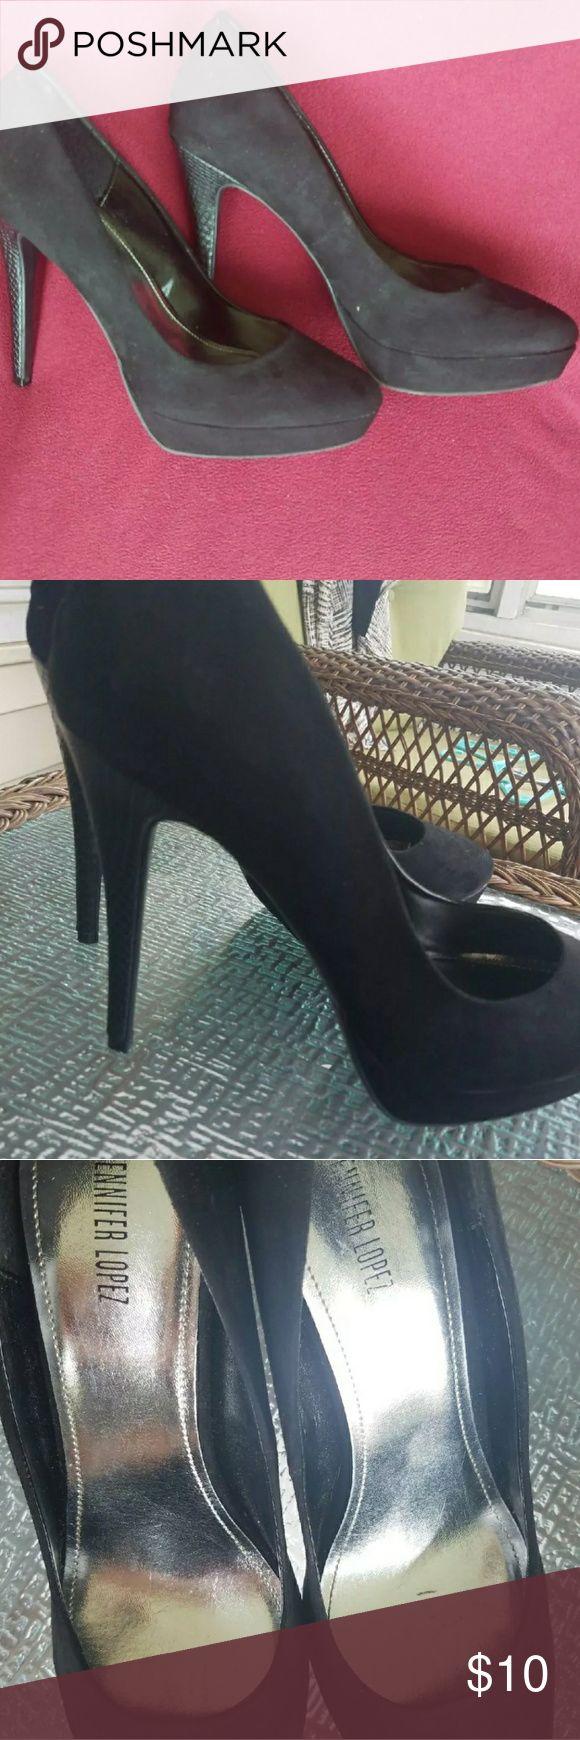 "Black size 10 Jennifer Lopez Stilettos Pre owned Feels almost like suede Heel height is roughly 4.5"" to 5"" Jennifer Lopez Shoes Heels"